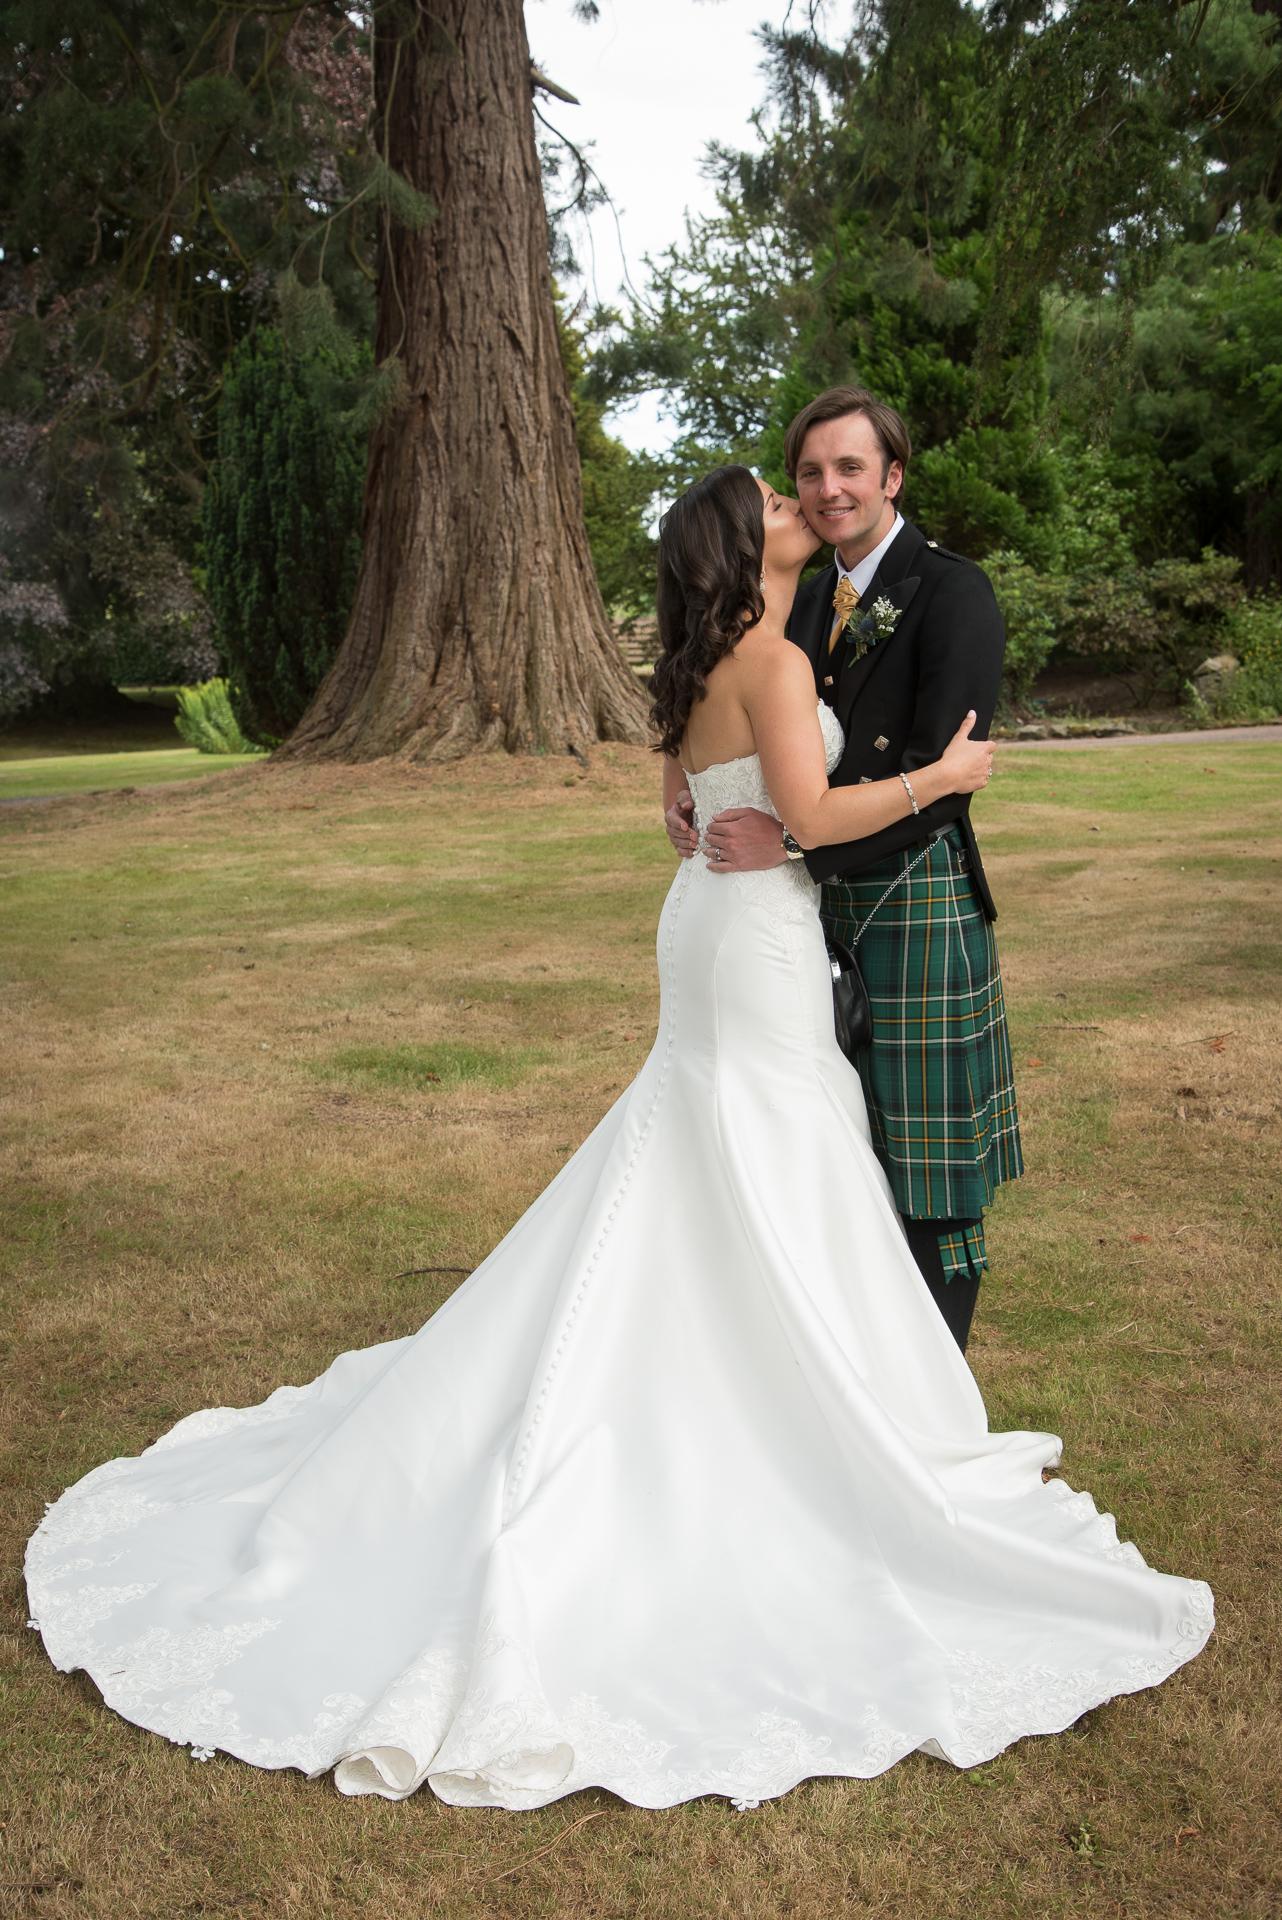 Beautiful wedding dress and kilt at Huntingtower Hotel